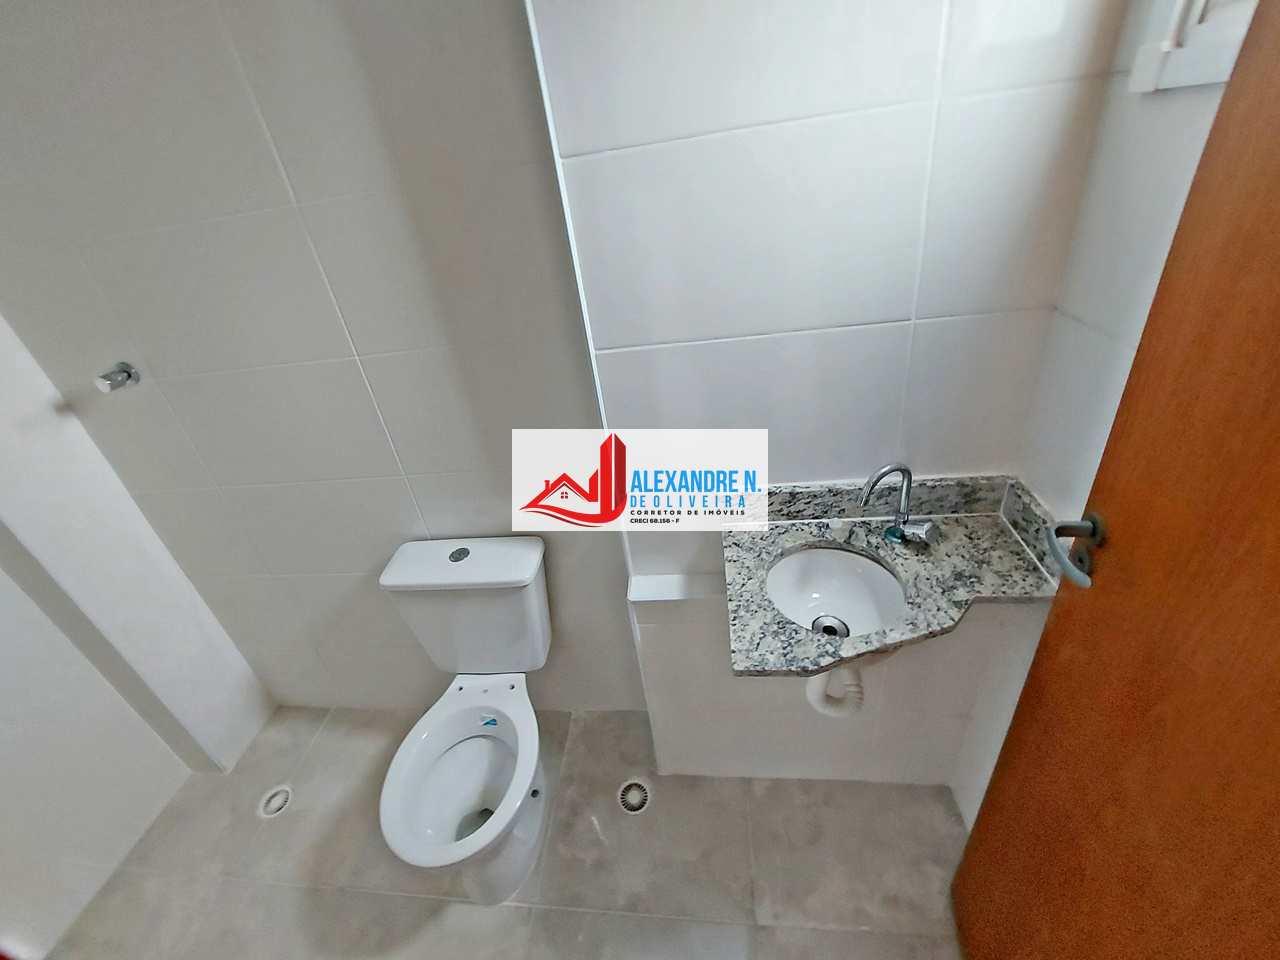 Apartamento 2 dorms, Ocian, Praia Grande - R$ 250 mil, AP00798